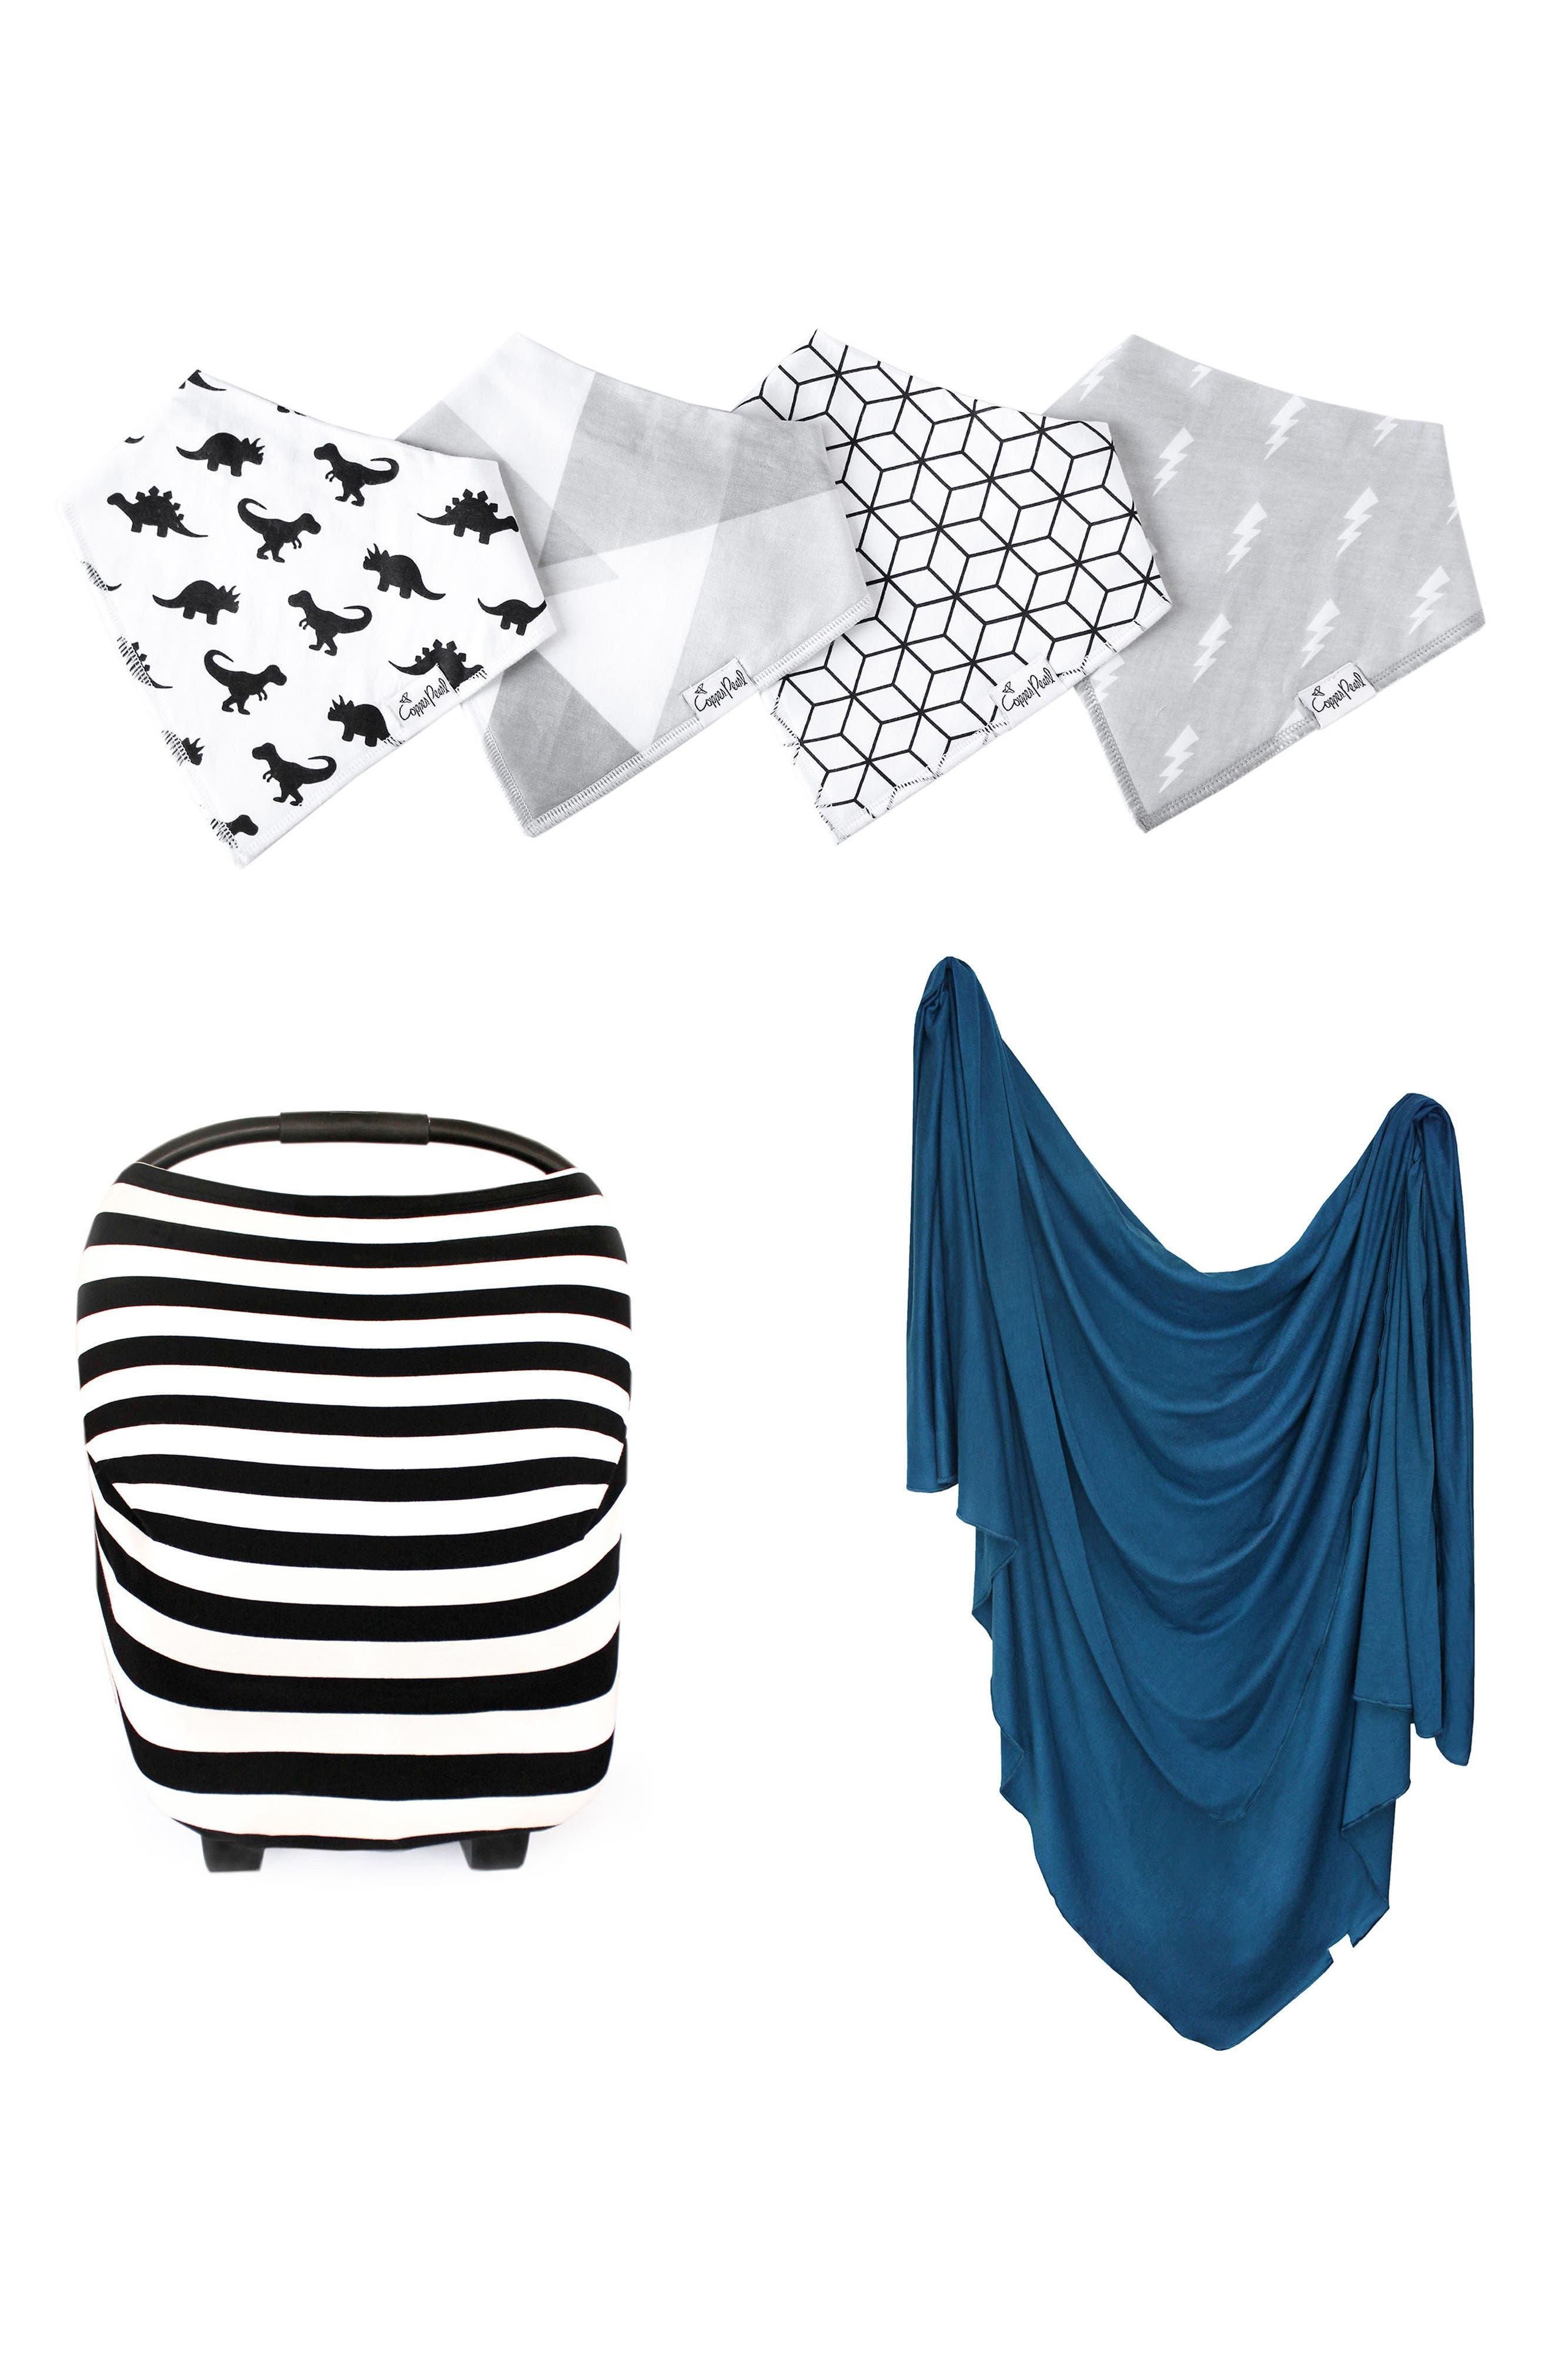 Copper Pearl River Bib, Multiuse Cover & Swaddle Blanket Gift Set